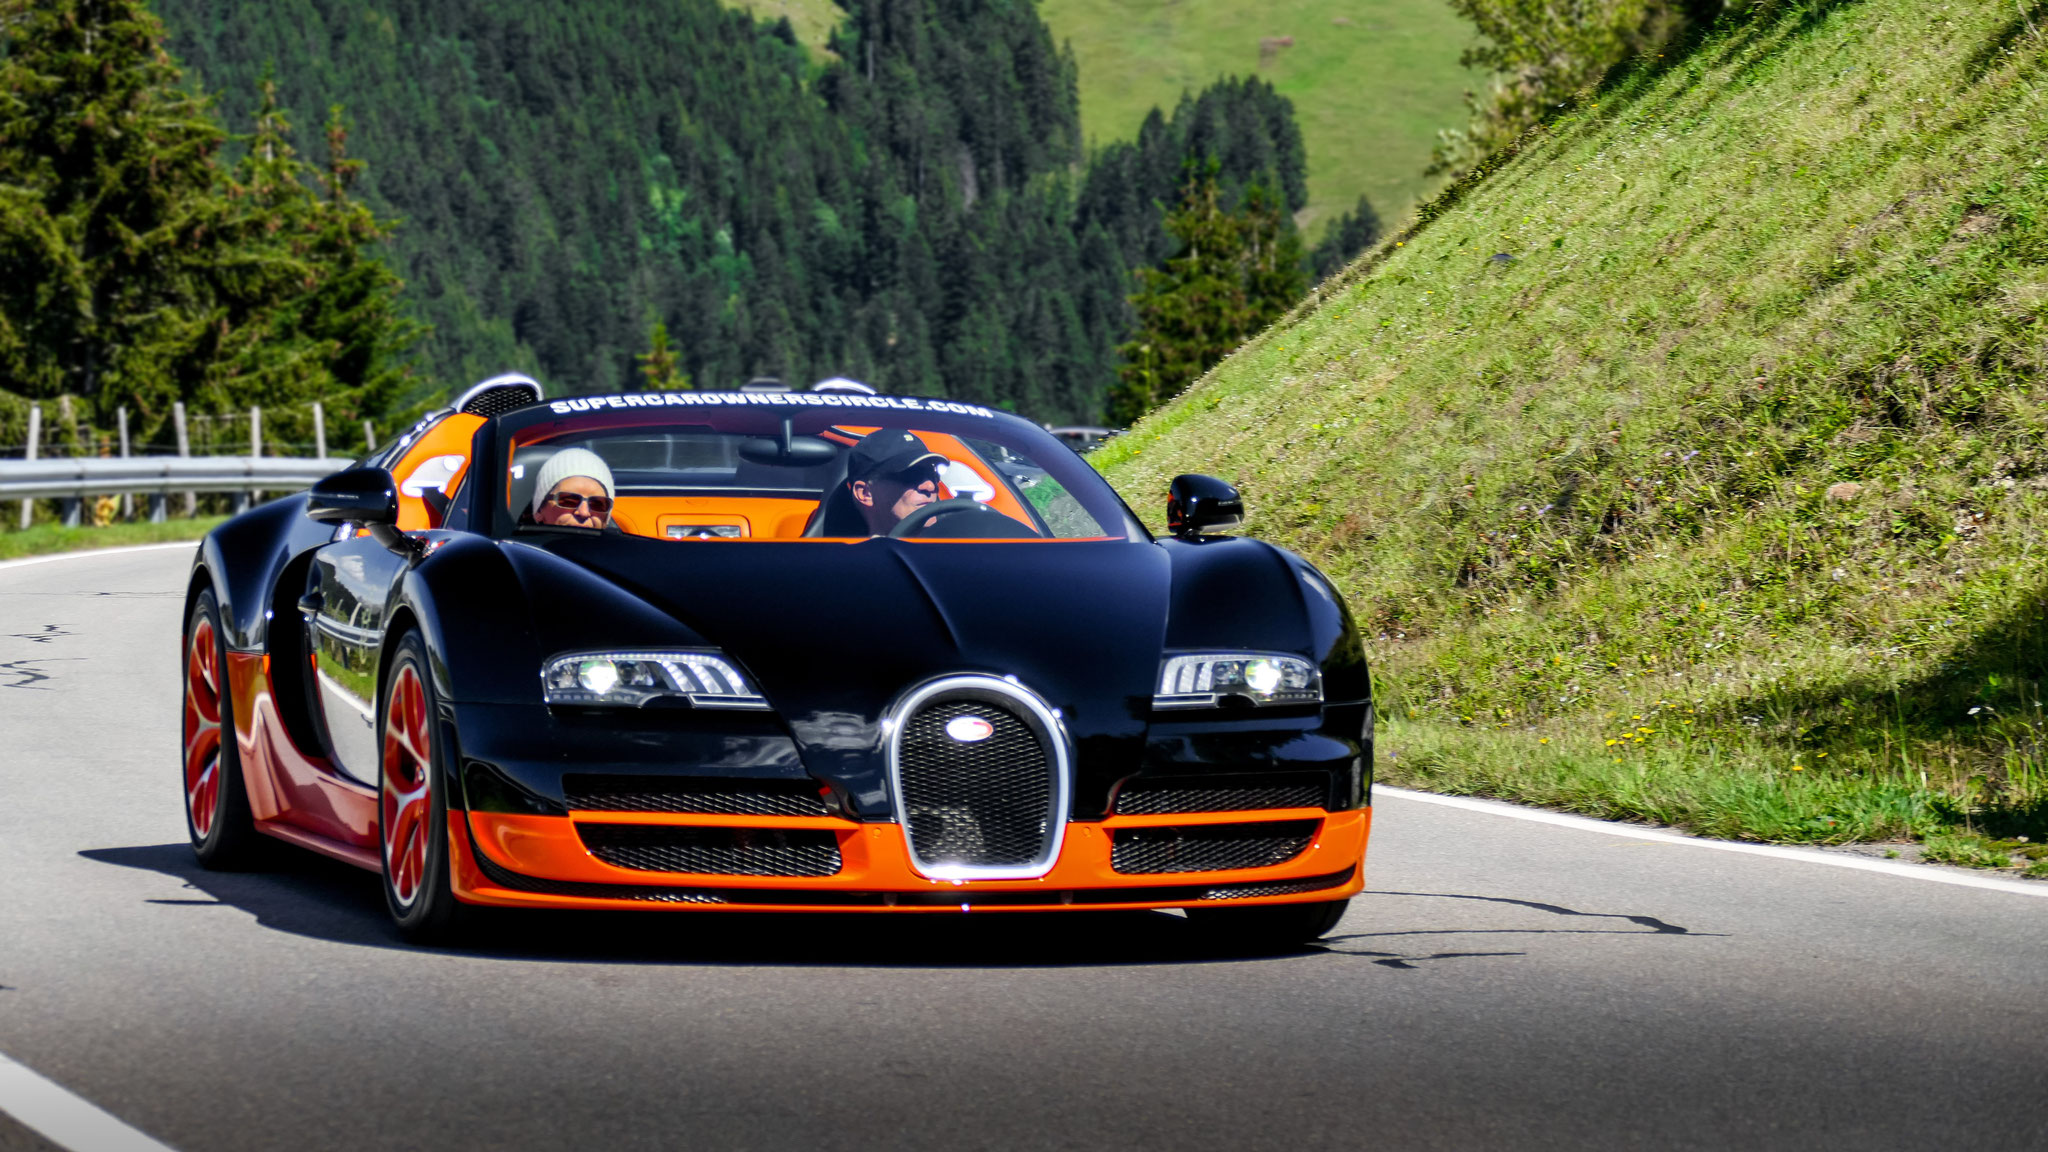 Bugatti Veyron Grand Sport Vitesse - GÖ-EB-430